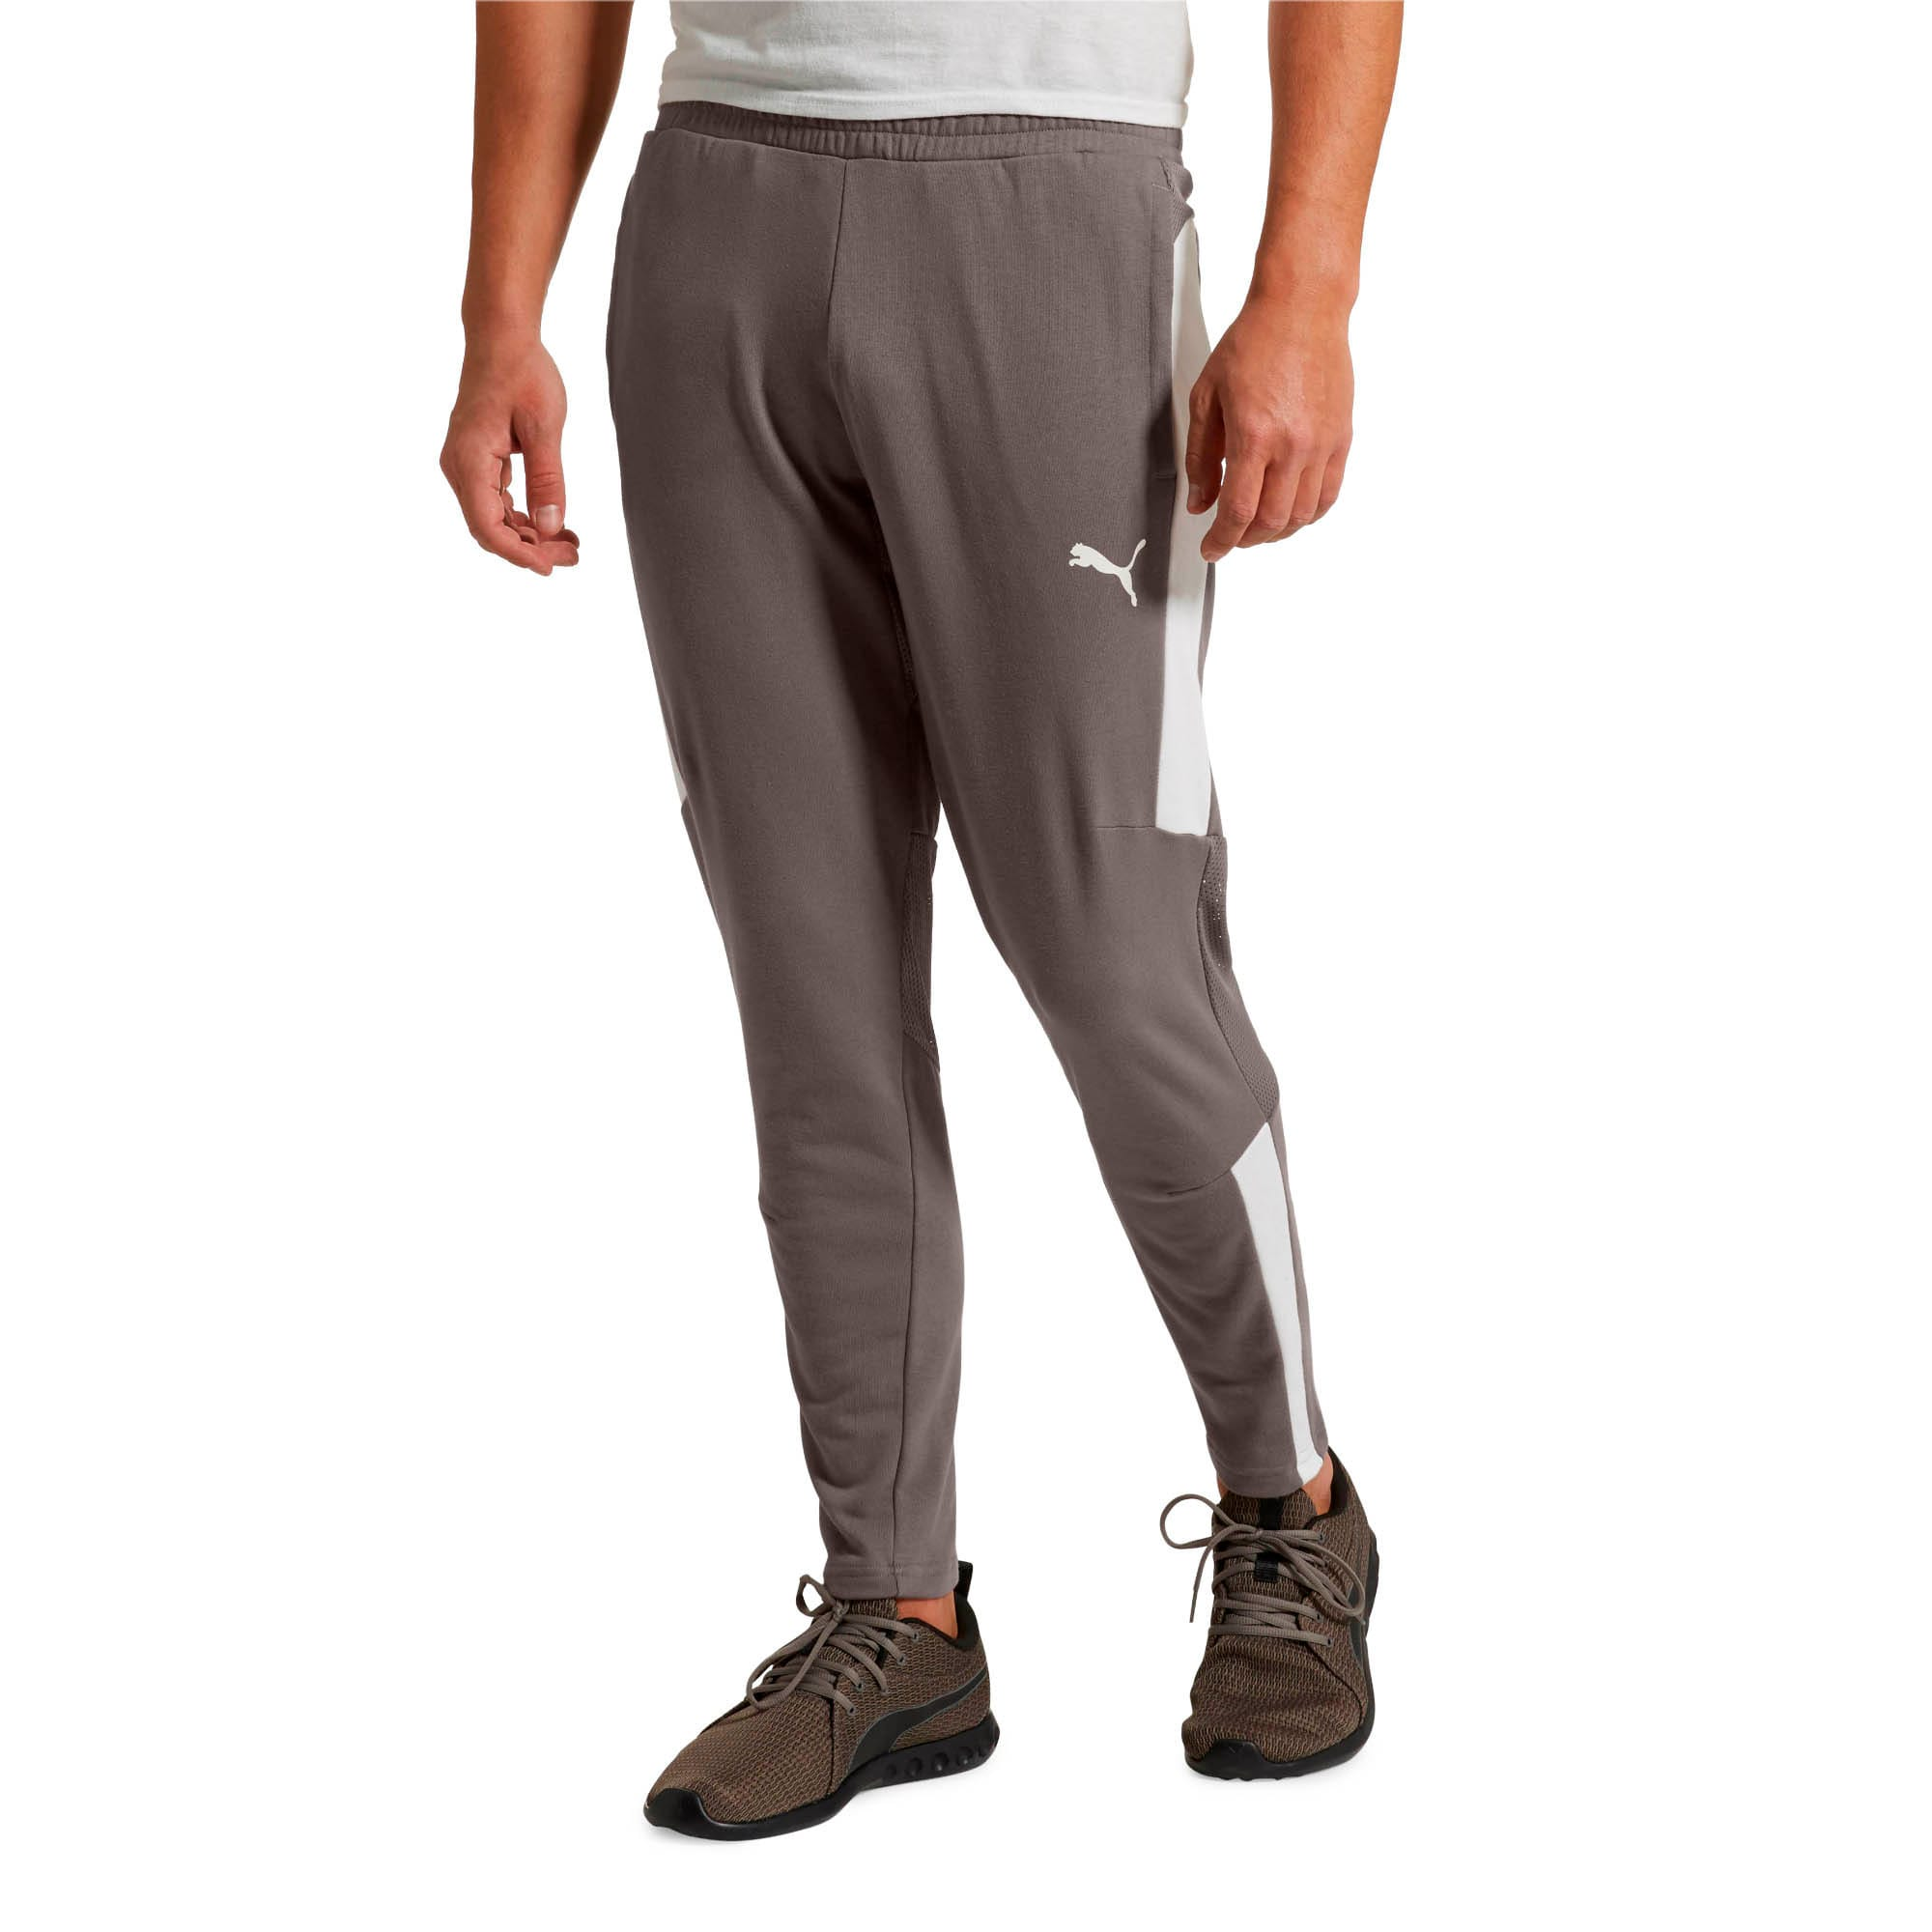 Thumbnail 2 of Energy Sweat Blaster Men's Pants, Charcoal Gray-Puma White, medium